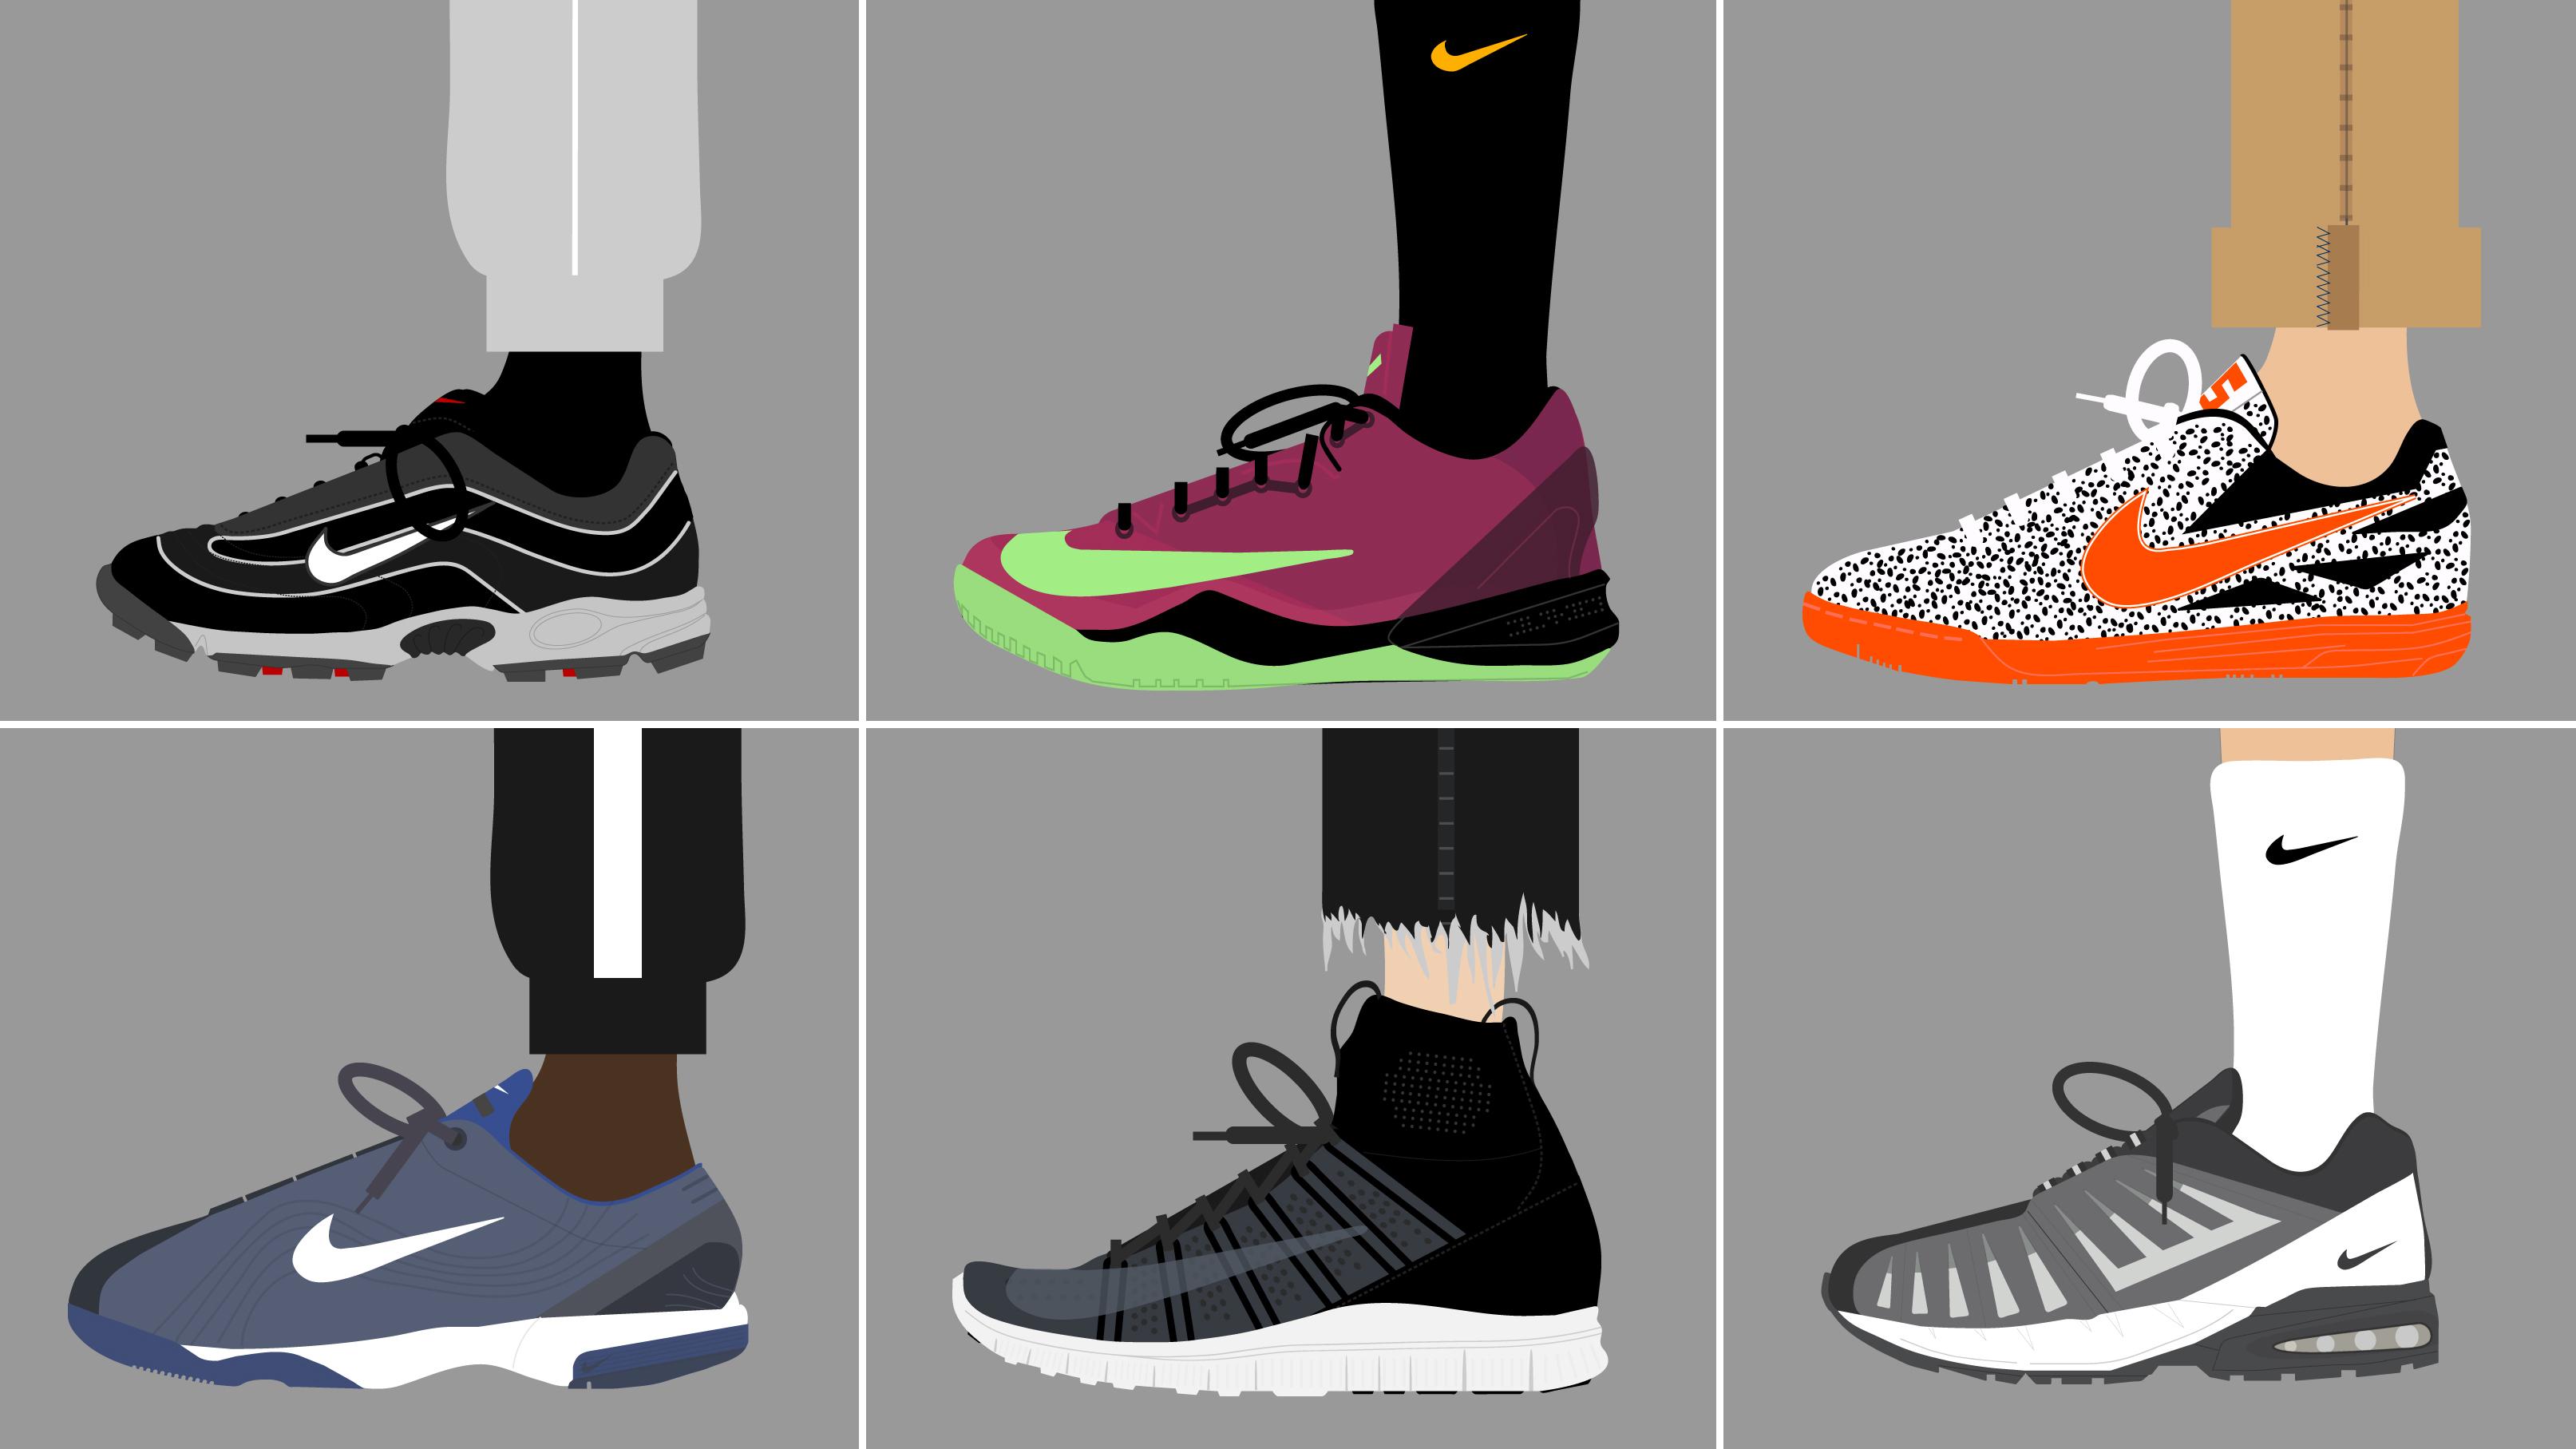 Sejarah Sepatu Nike Mercurial Dari Sepatu Bola Ke Street